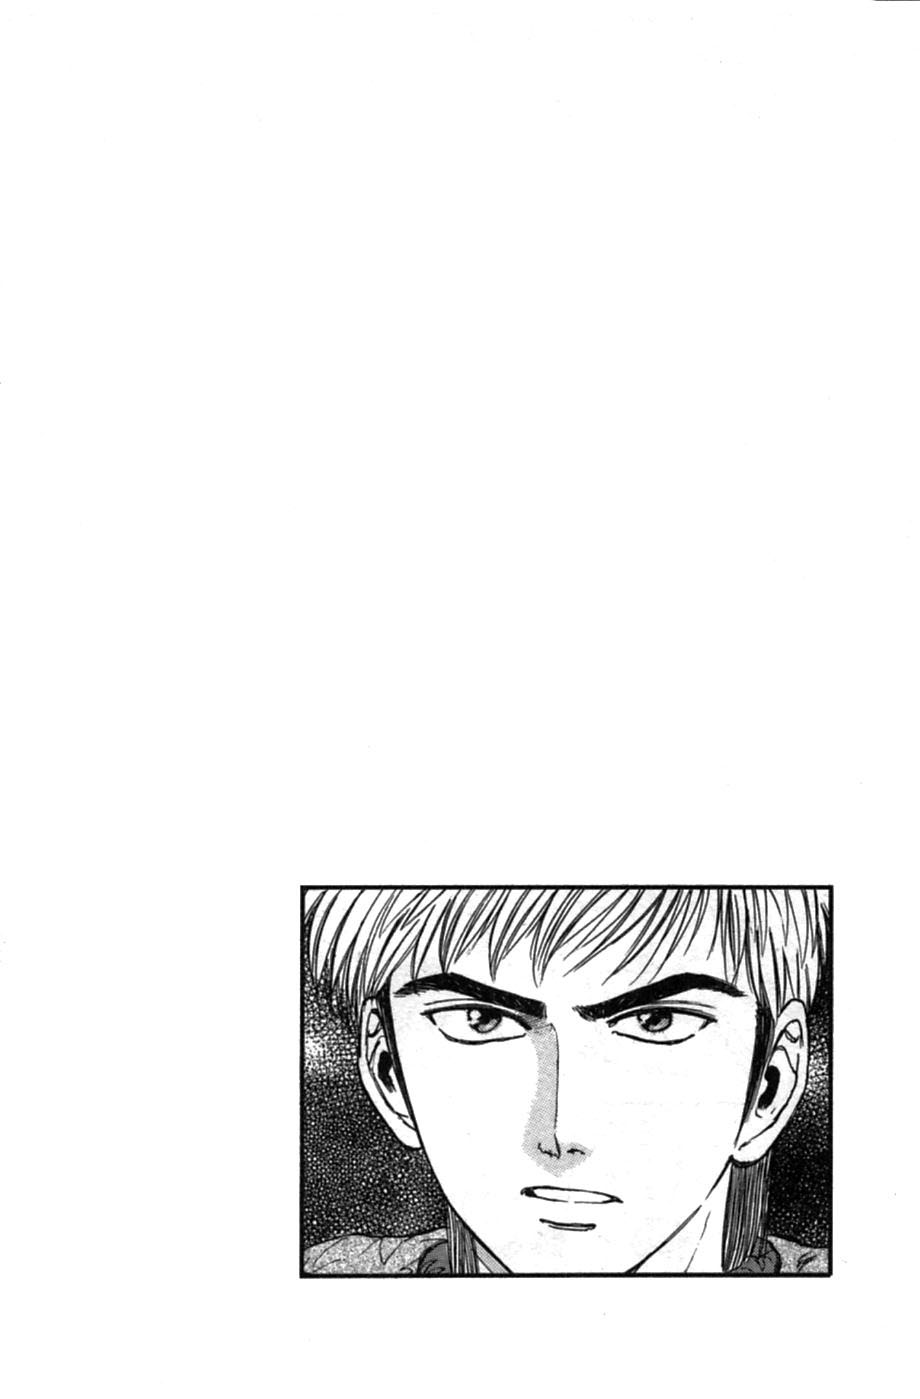 Psychometrer Eiji chapter 43 trang 23